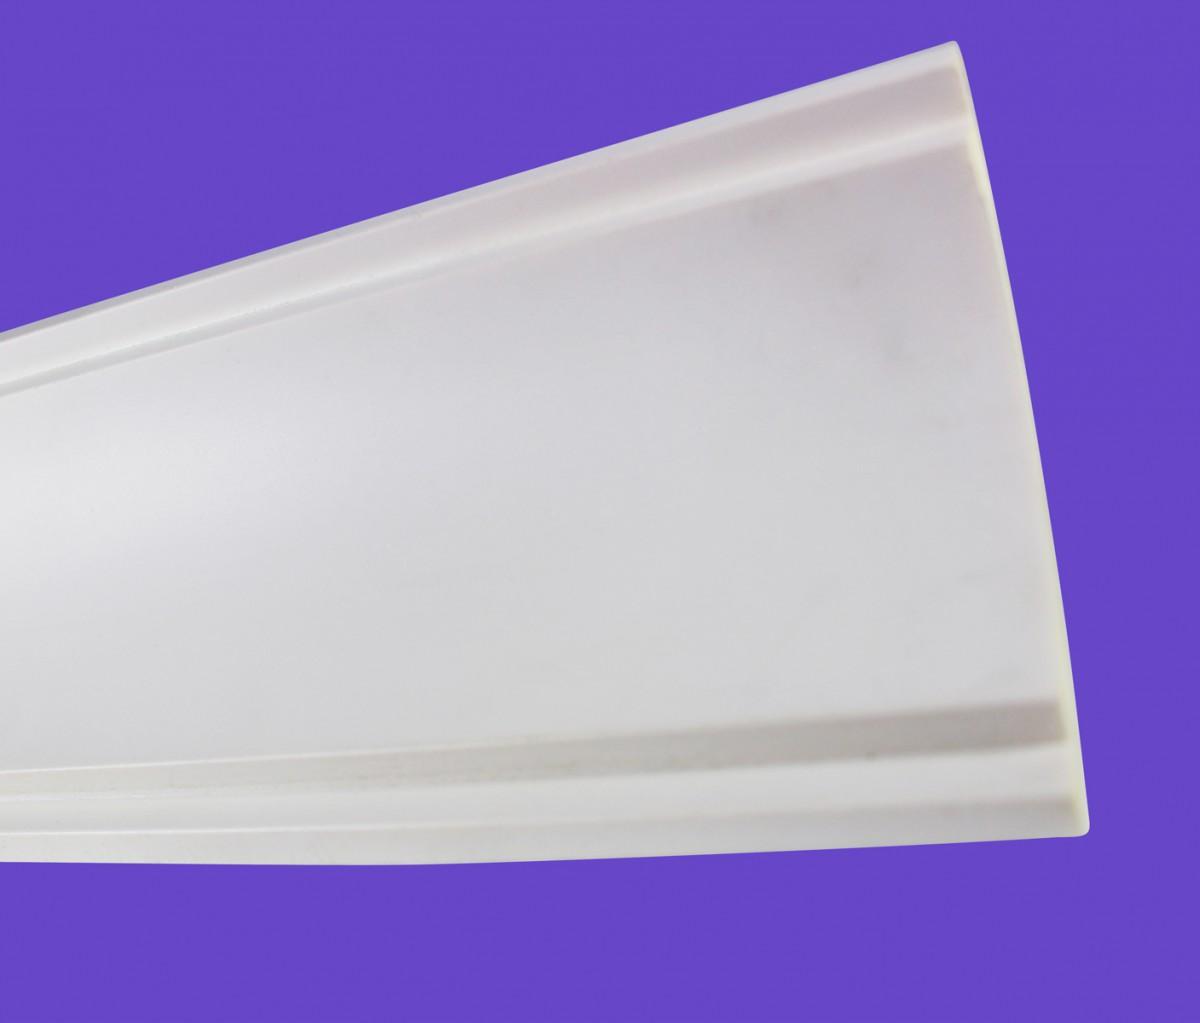 Cornice White Urethane Sample of 11771 23.5 Long Cornice Cornice Moulding Cornice Molding